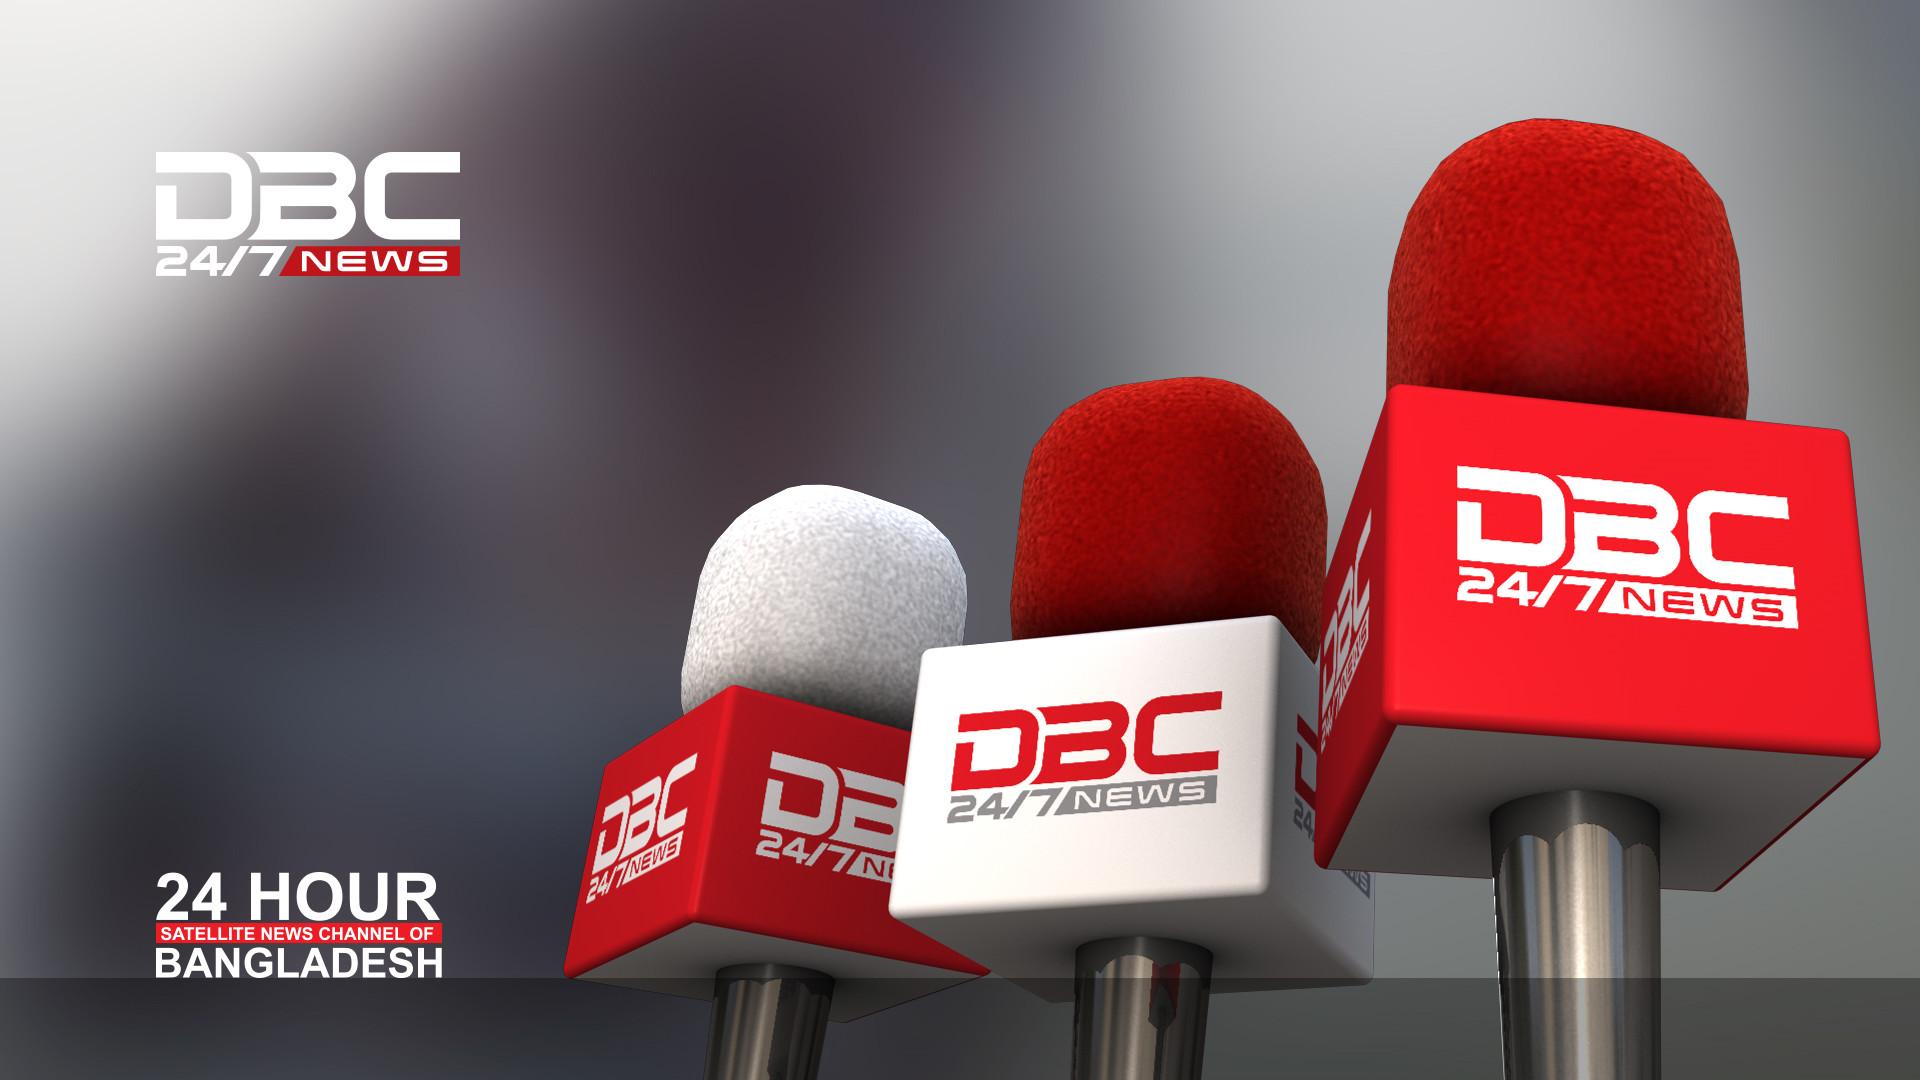 ArtStation - DBC NEWS | DHAKA, BANGLADESH | logo design by SADEK